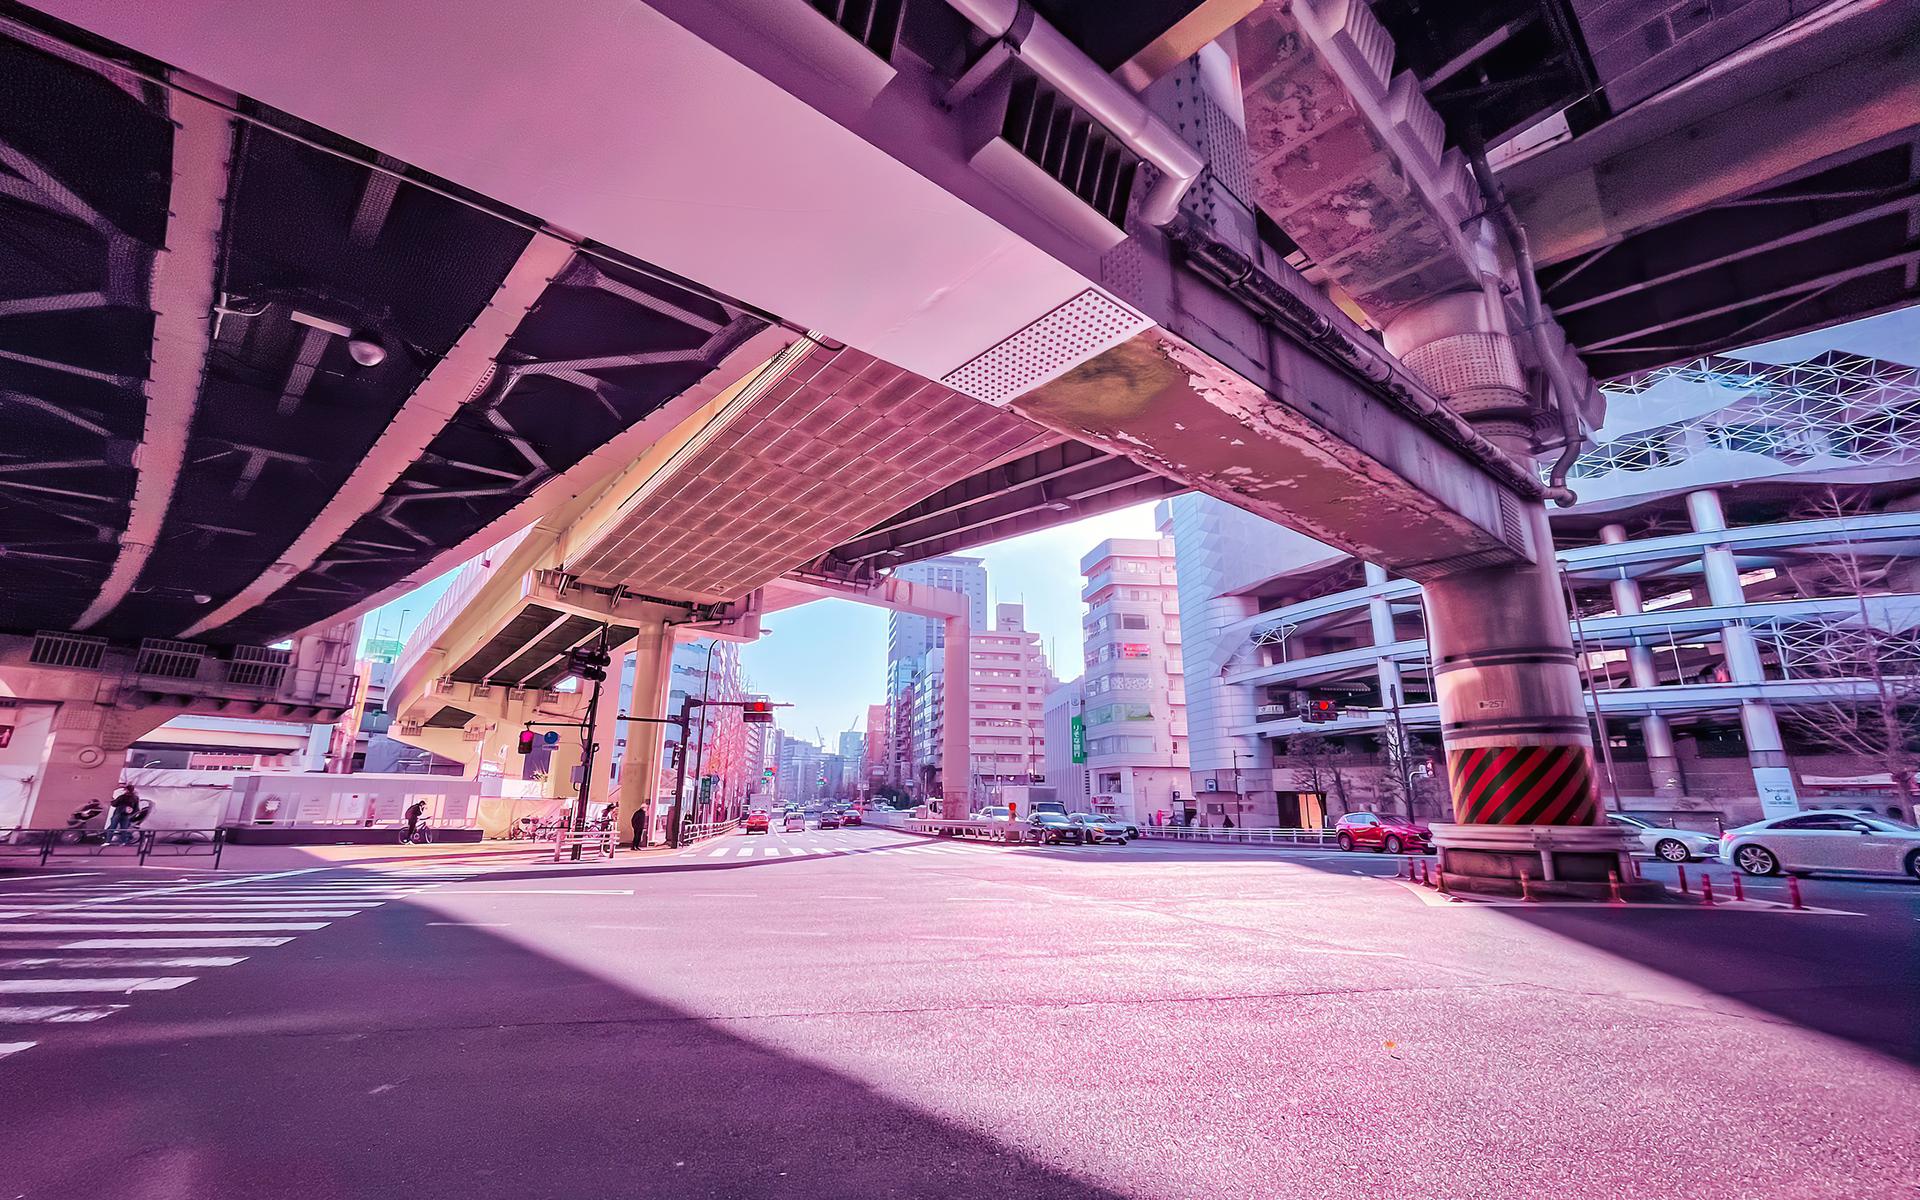 city-view-botoom-bridge-4k-zl.jpg